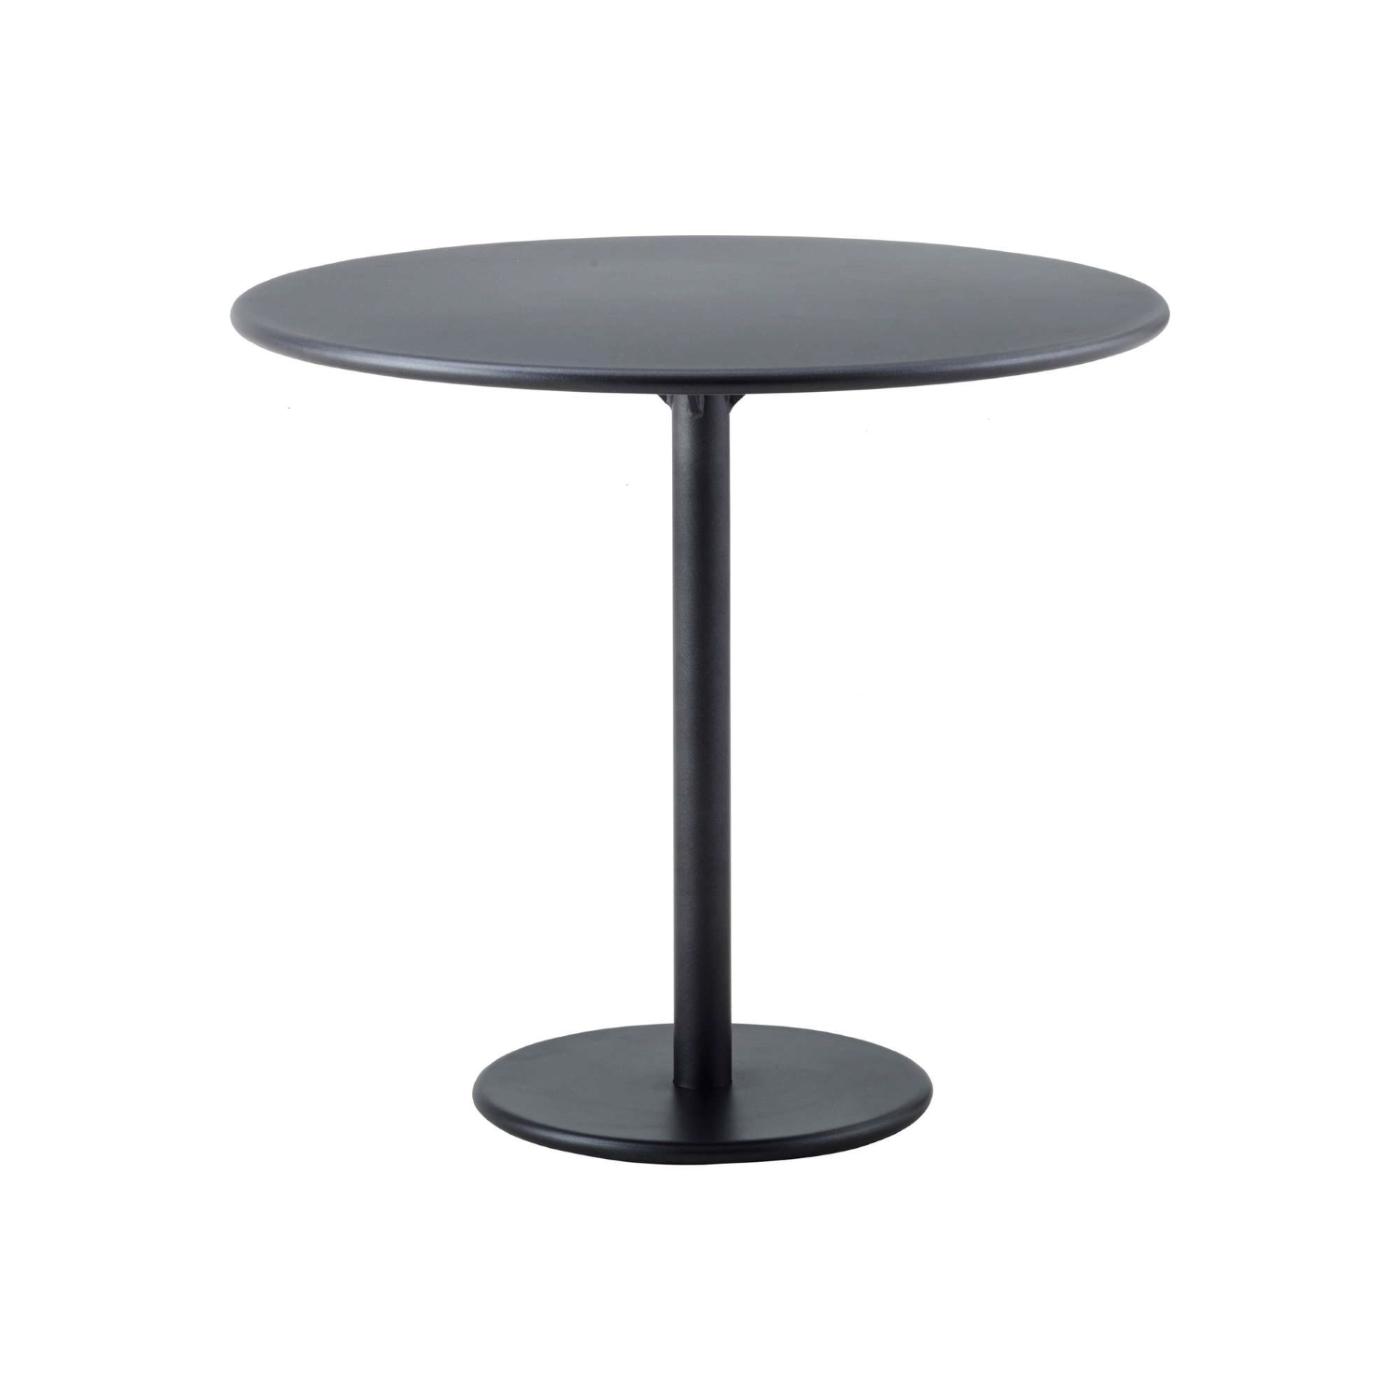 Cafébord GO Ø 80 cm lavagrå, Cane-line